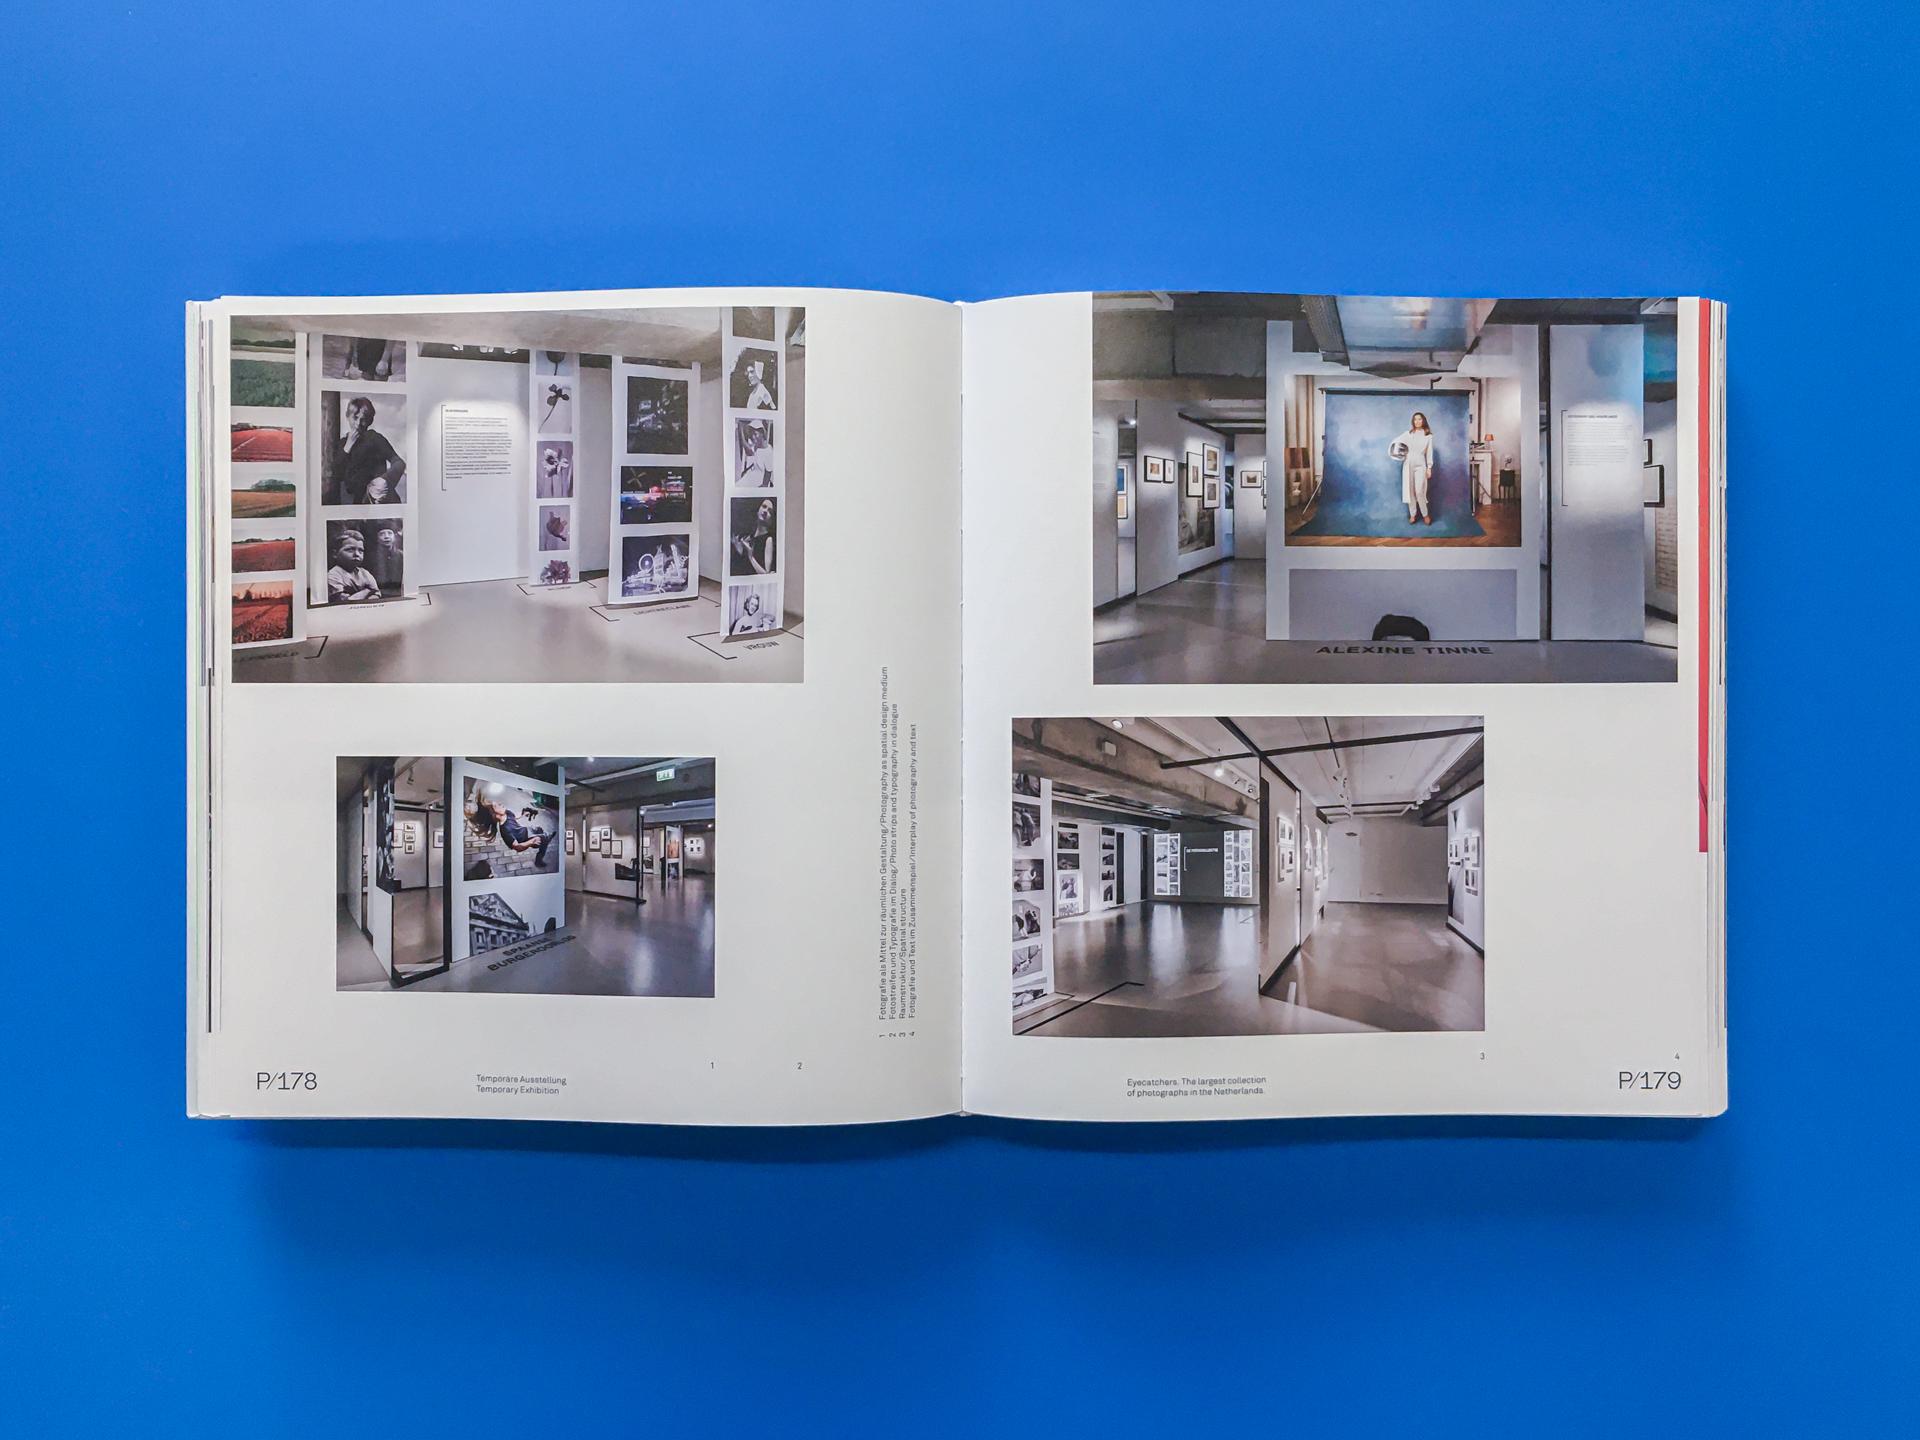 dvvd na new exhibition design 03 book 3 jpg